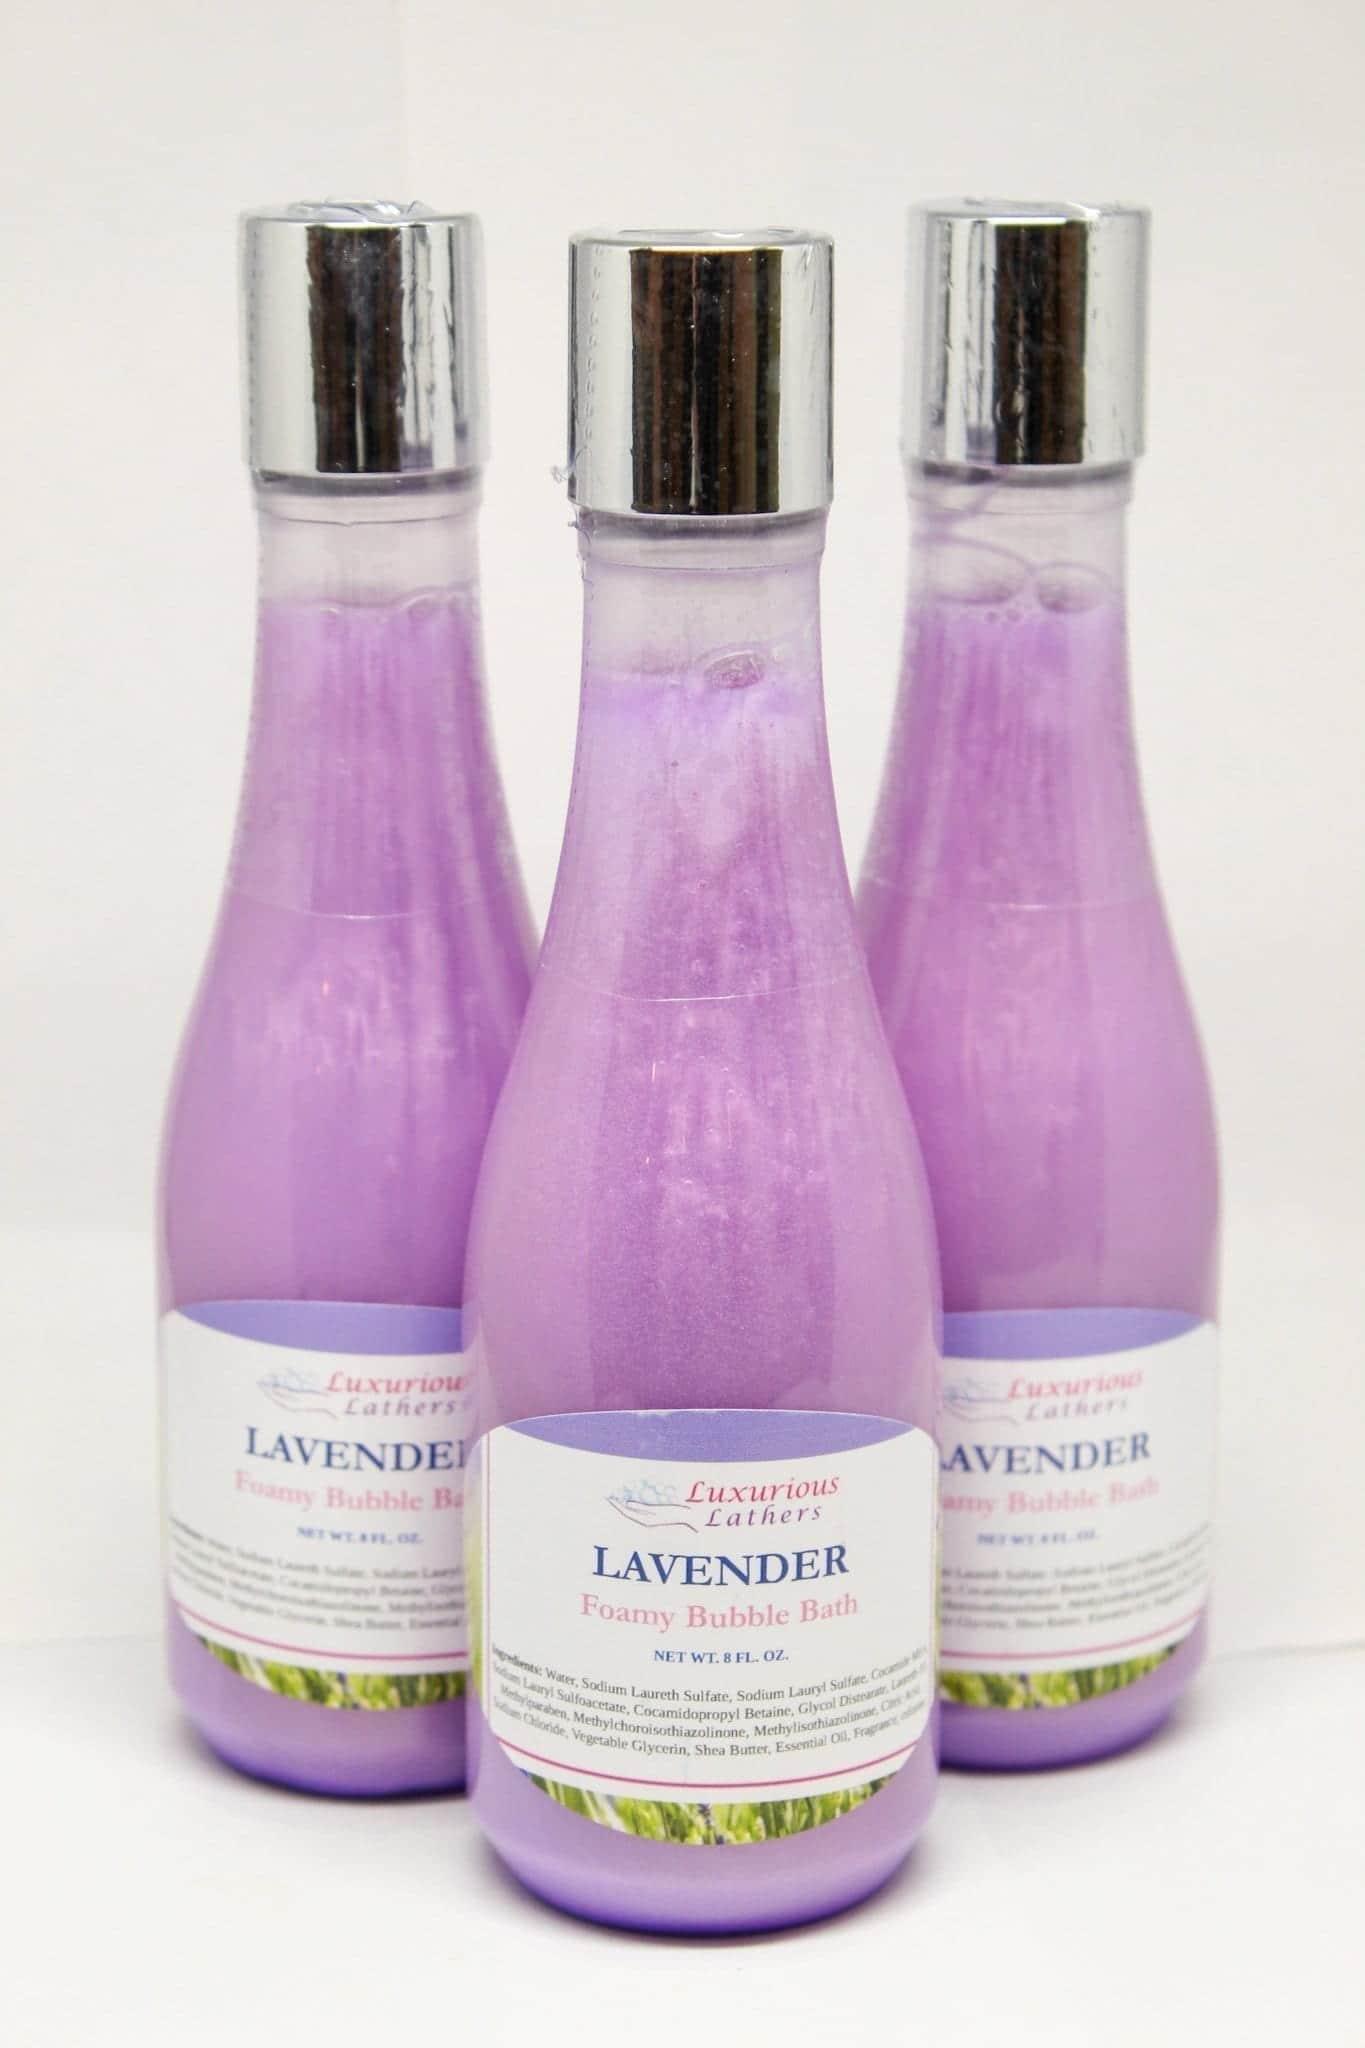 Lavender Foamy Bubble Bath